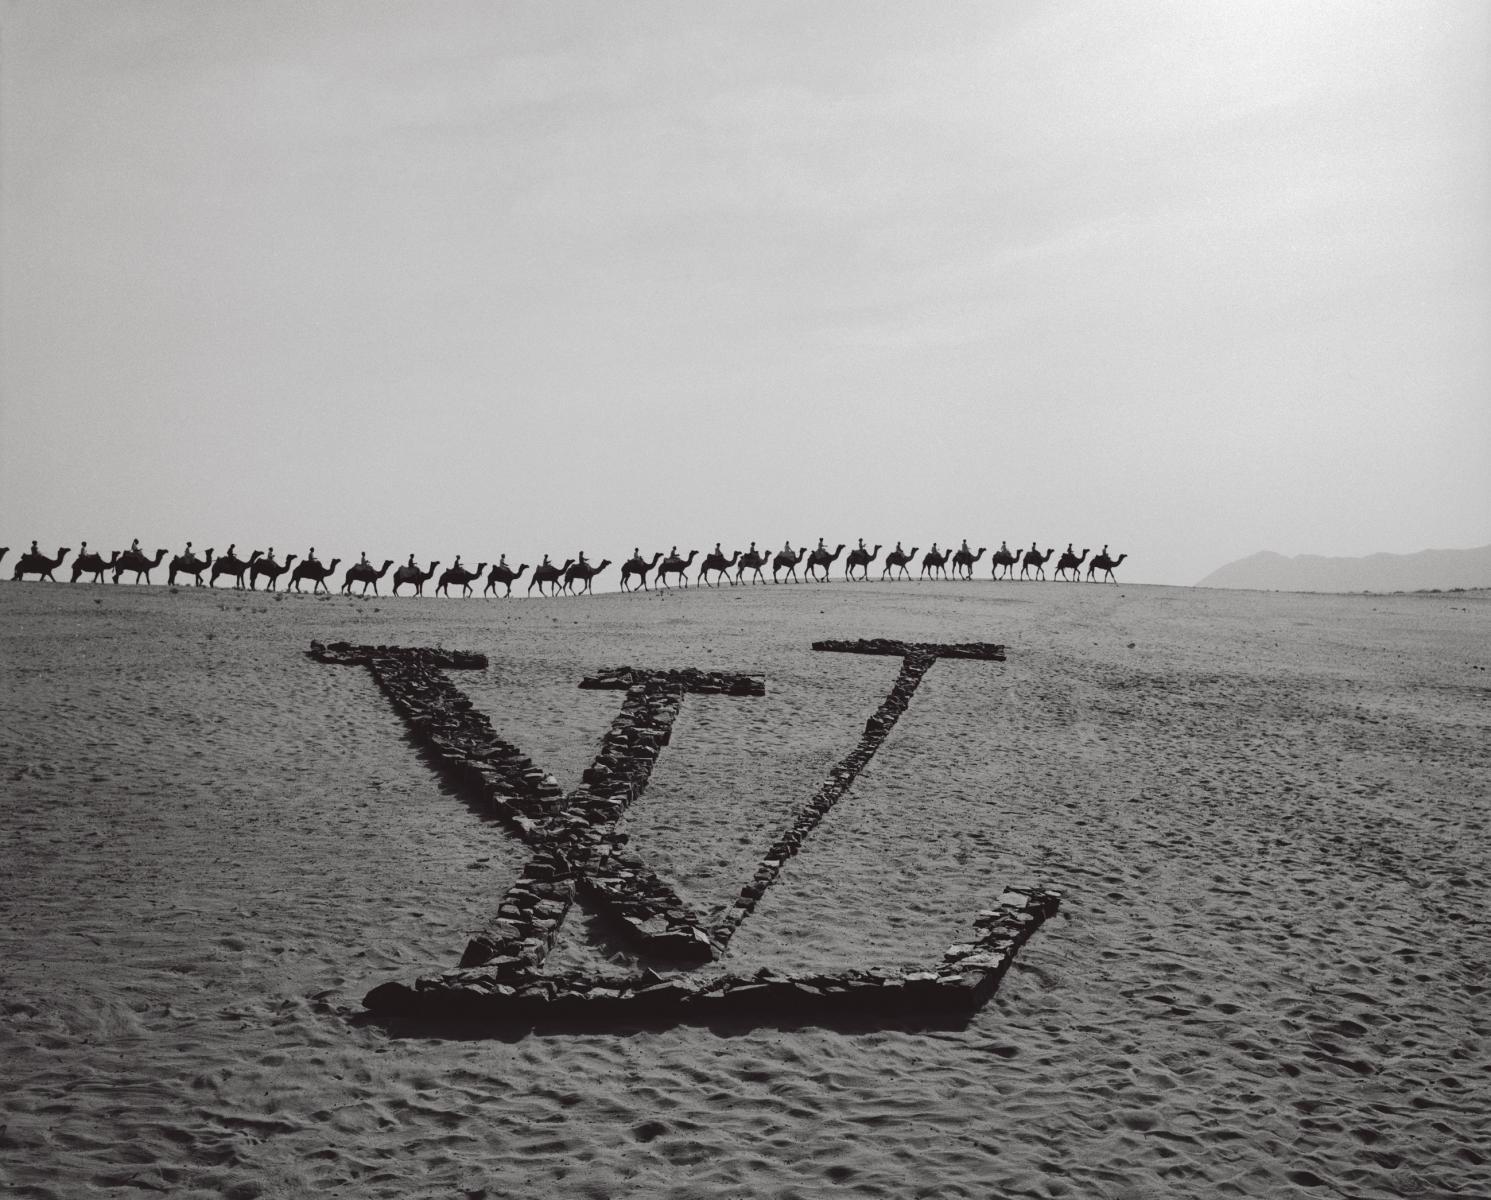 2020年IG最夯Hashtag「#Throwback」出爐!LV靠40年前舊廣告,告訴你疫情結束後該去哪旅行?-2